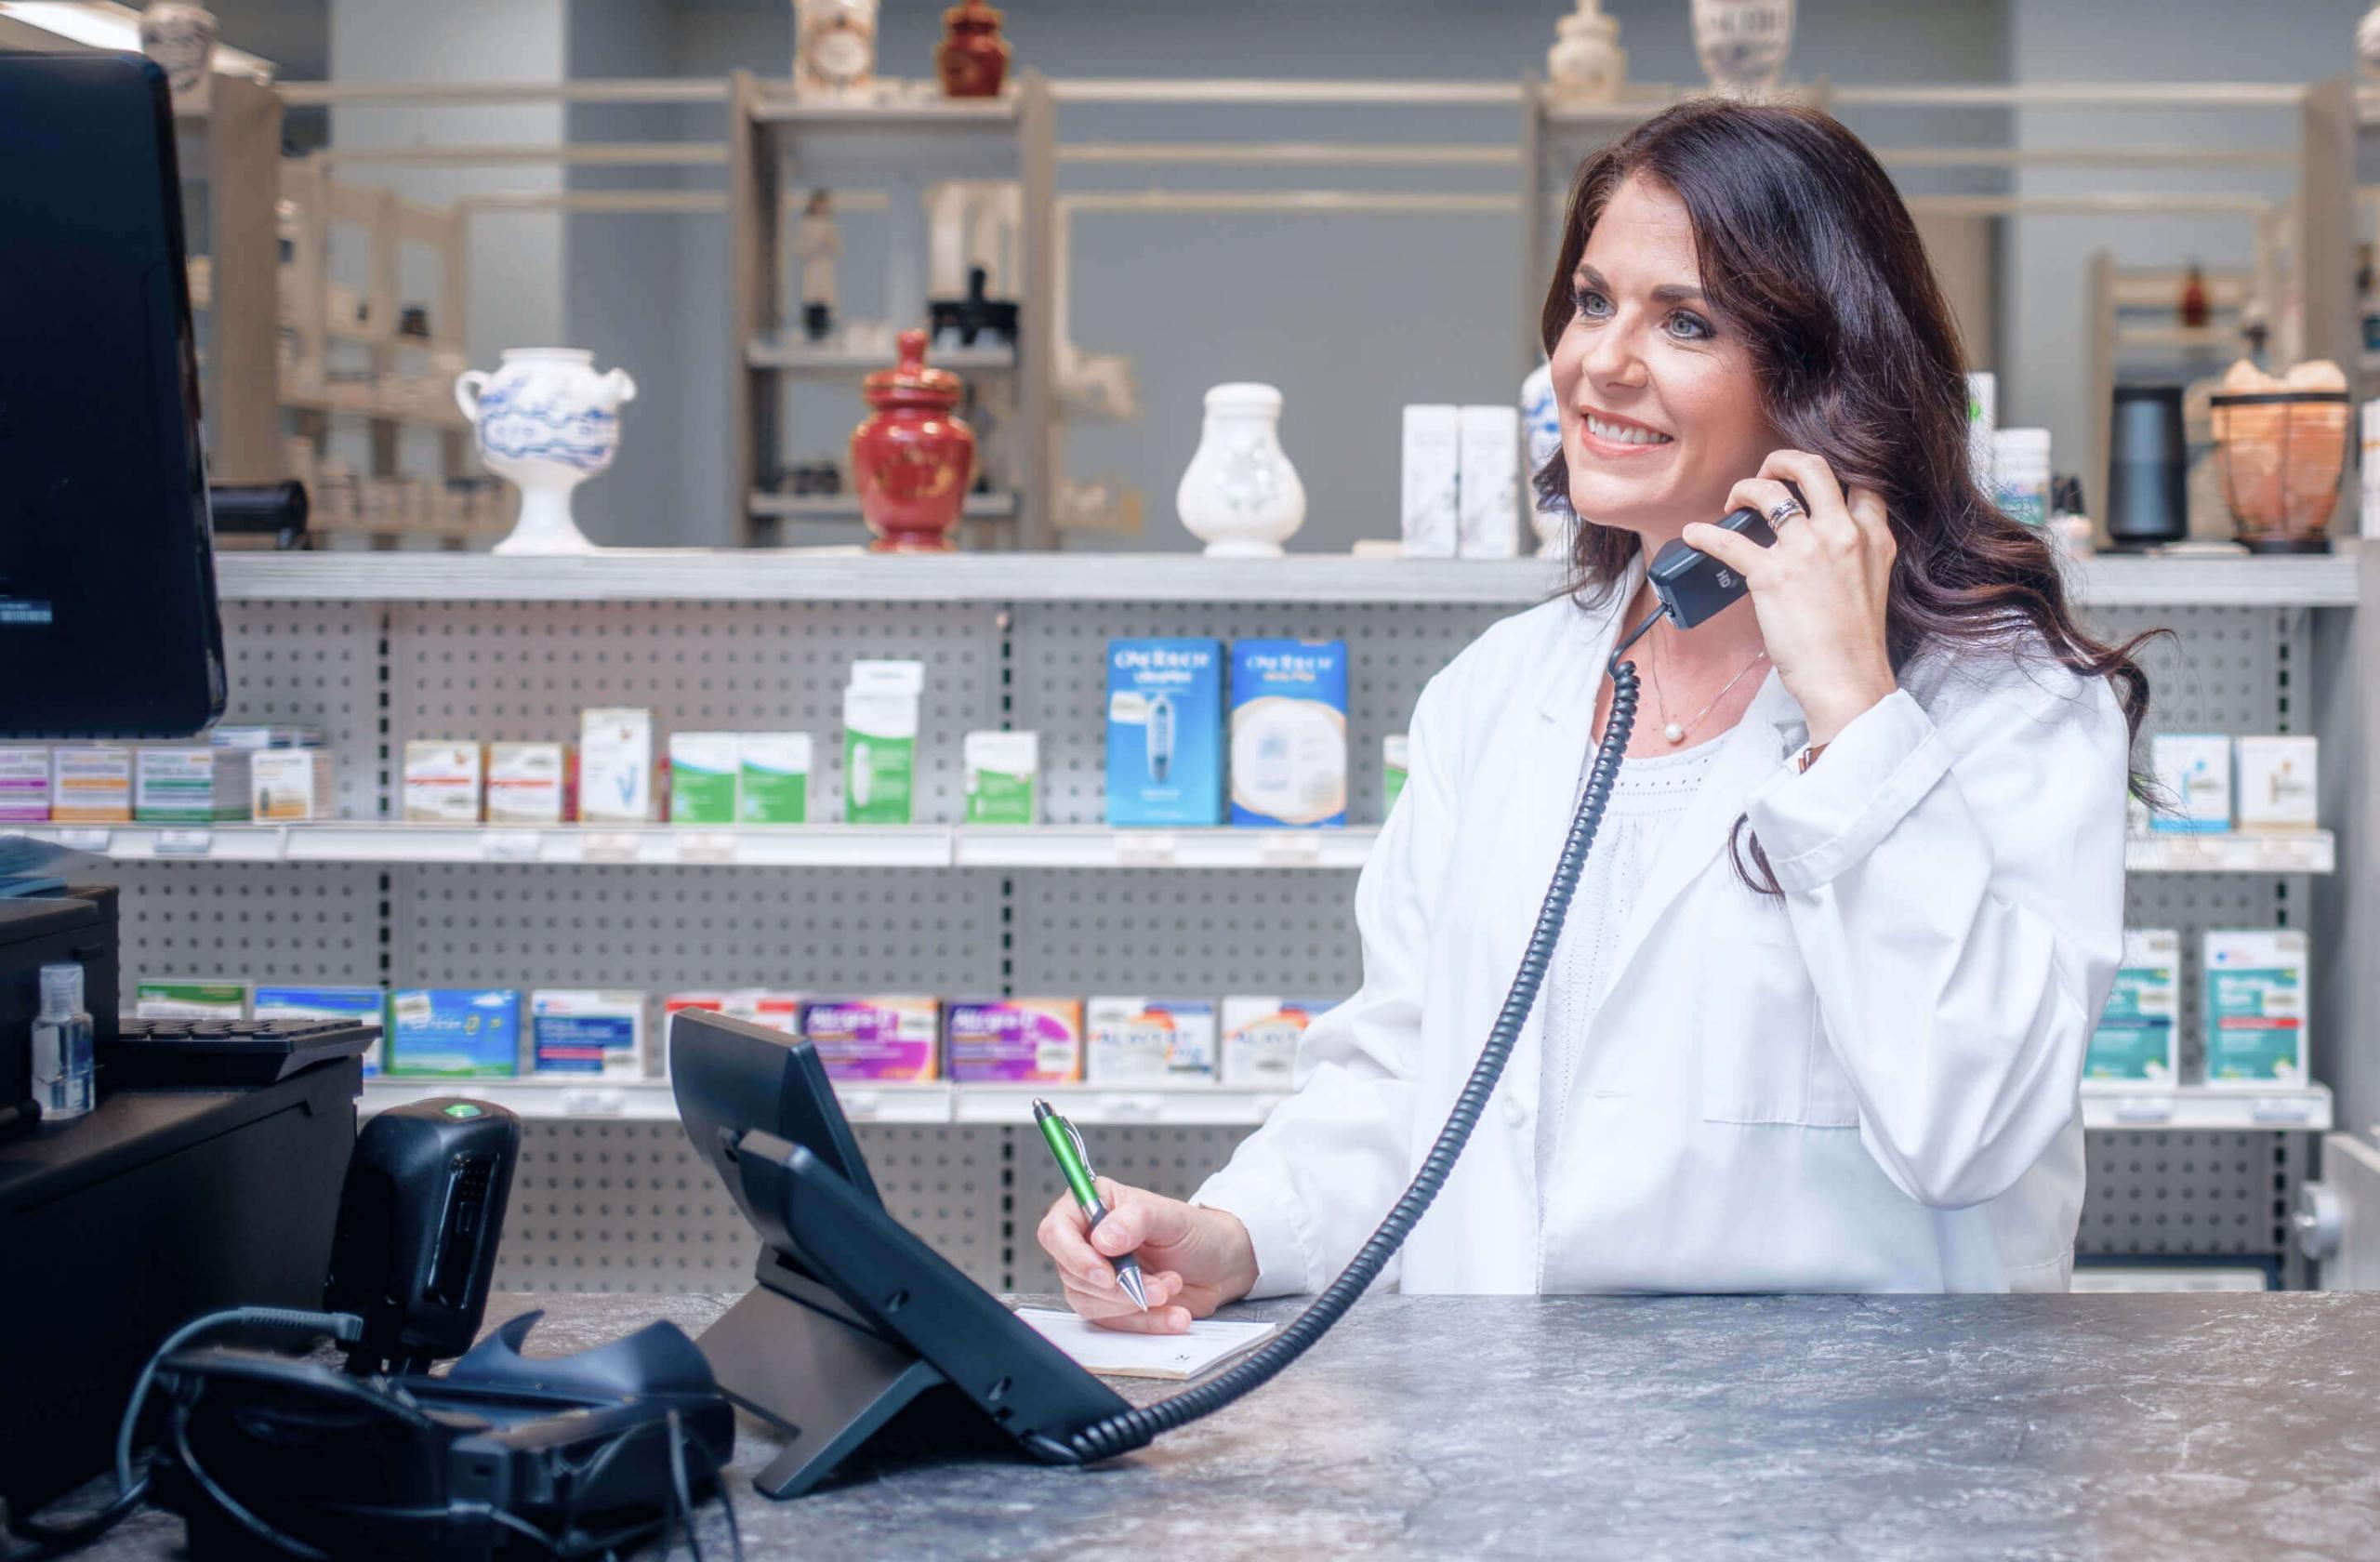 woman on phone in pharmacy